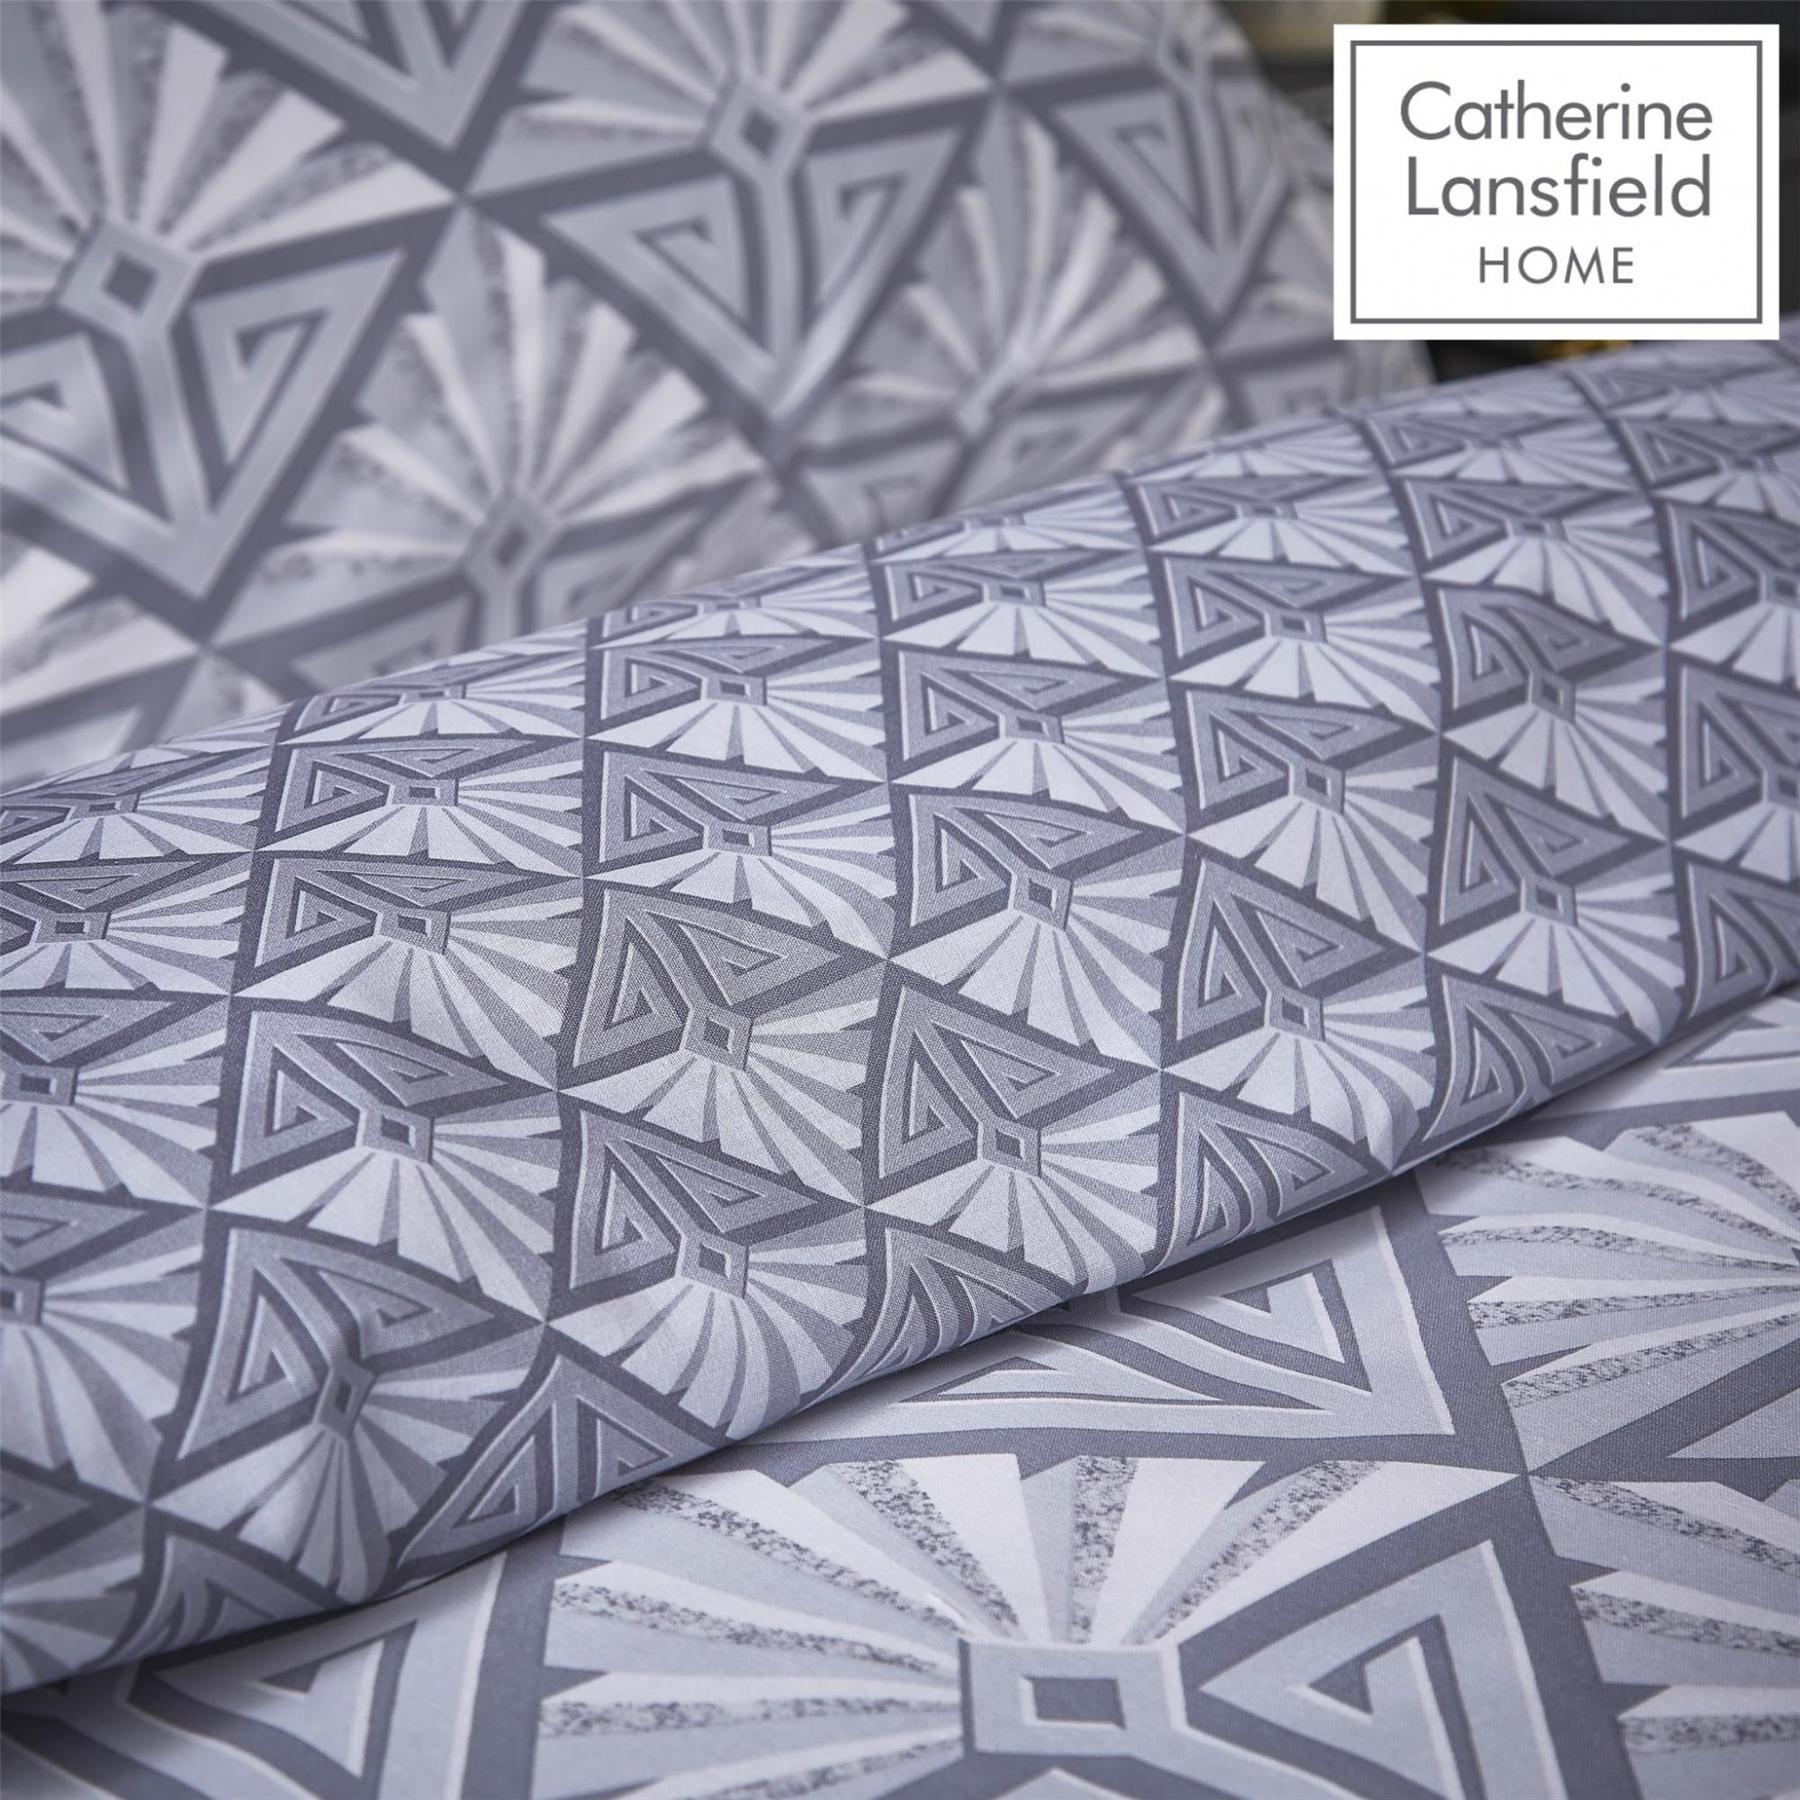 Catherine-Lansfield-Duvet-Set-Reversible-Art-Deco-Grey-Bedding-Pillows-Curtains thumbnail 13